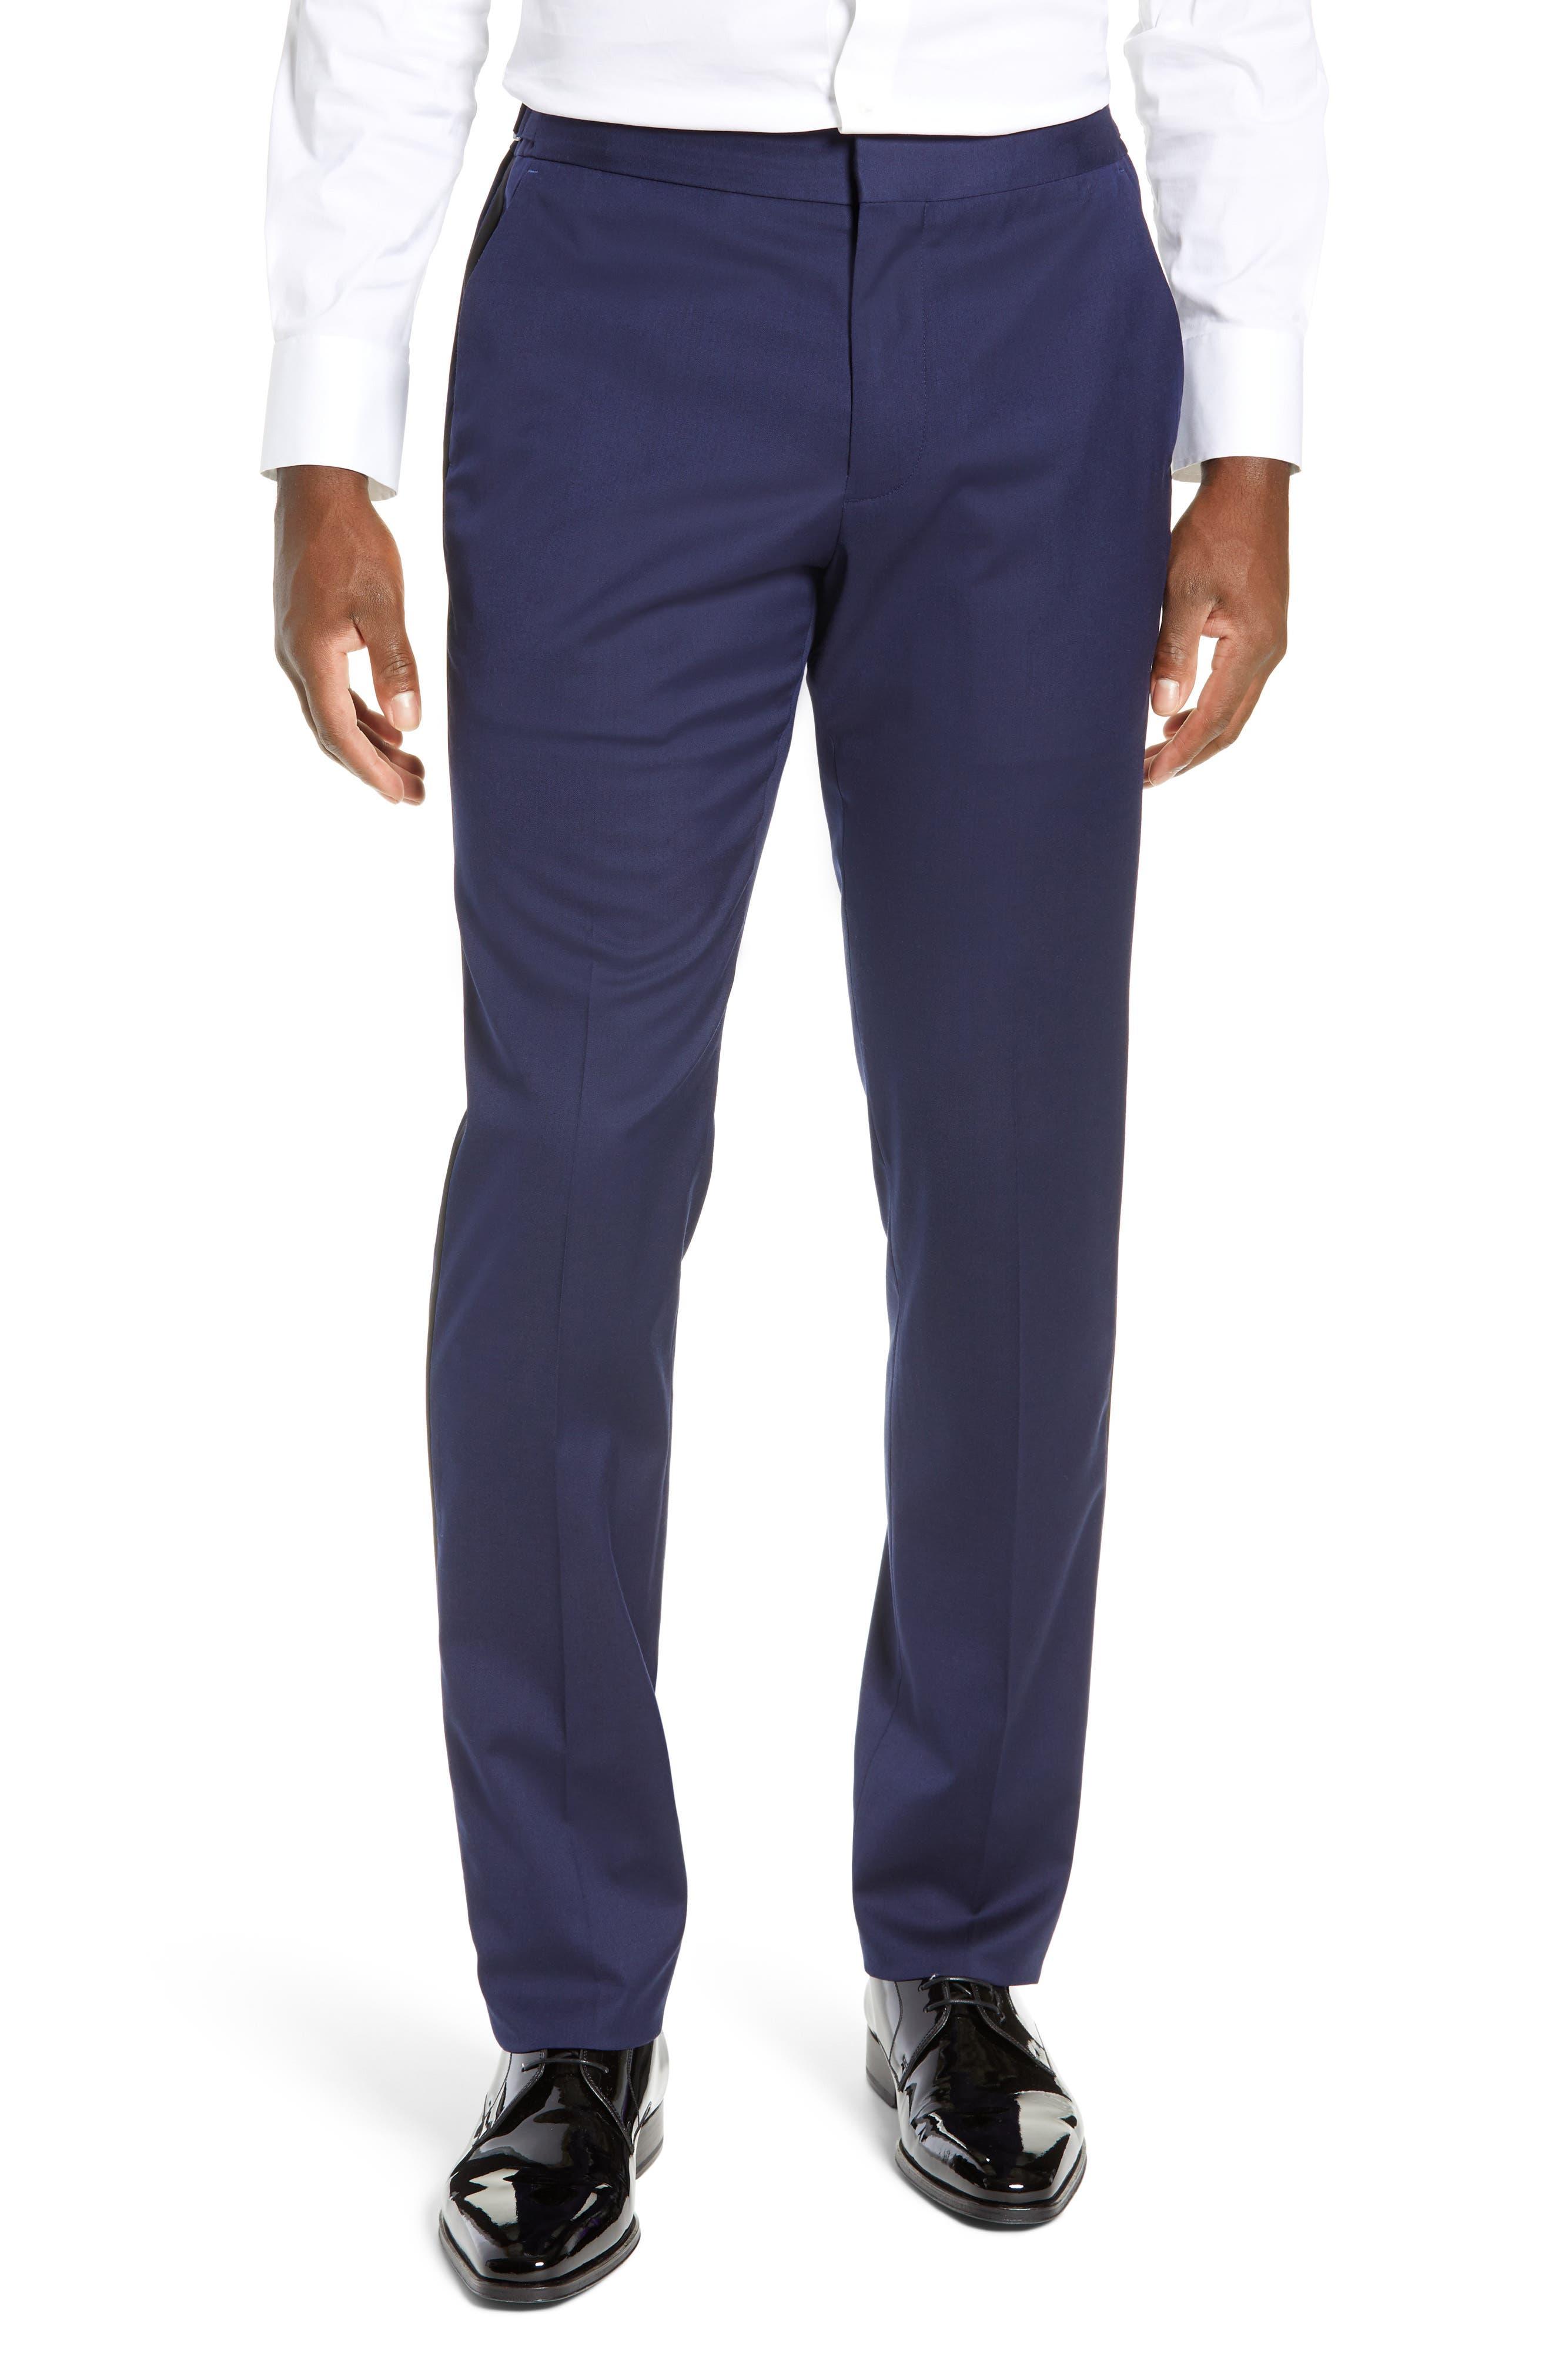 Capstone Slim Fit Tuxedo Trousers,                             Main thumbnail 1, color,                             NAVY